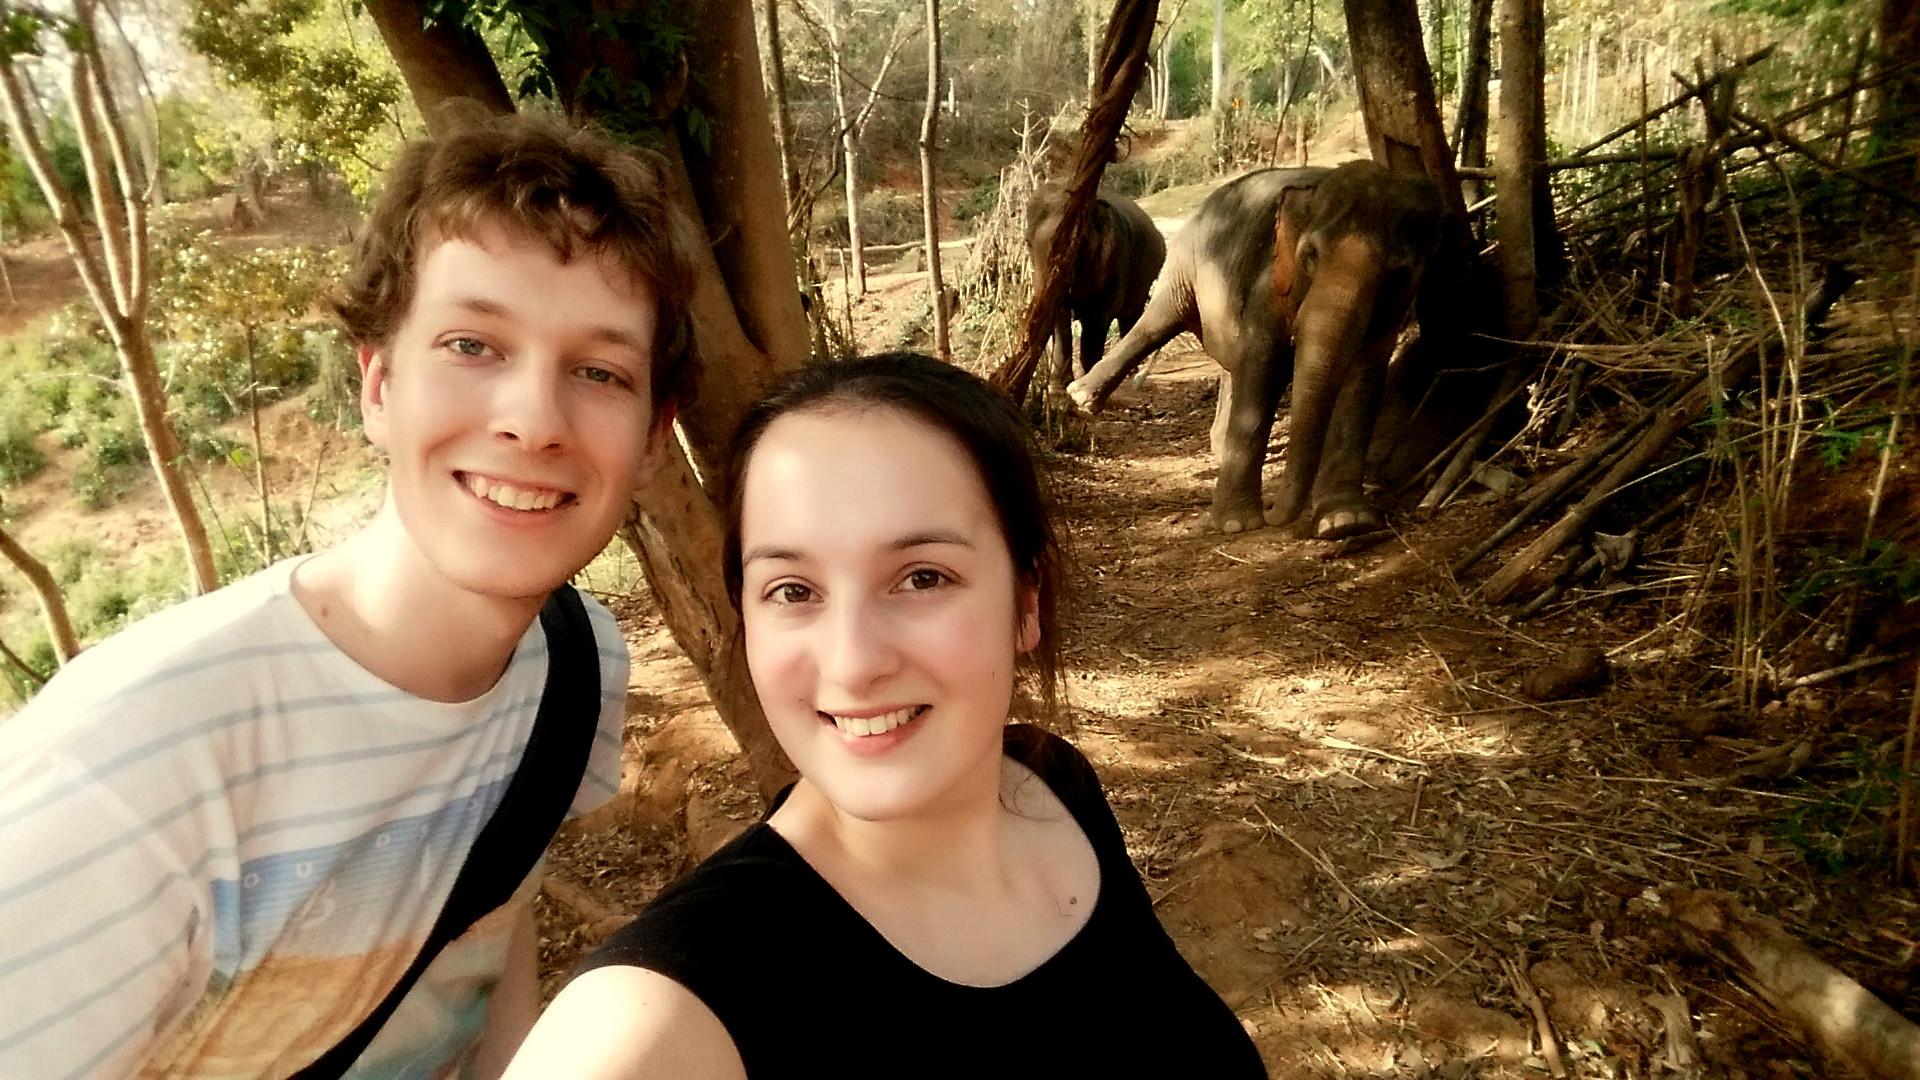 114. Een olifant wassen